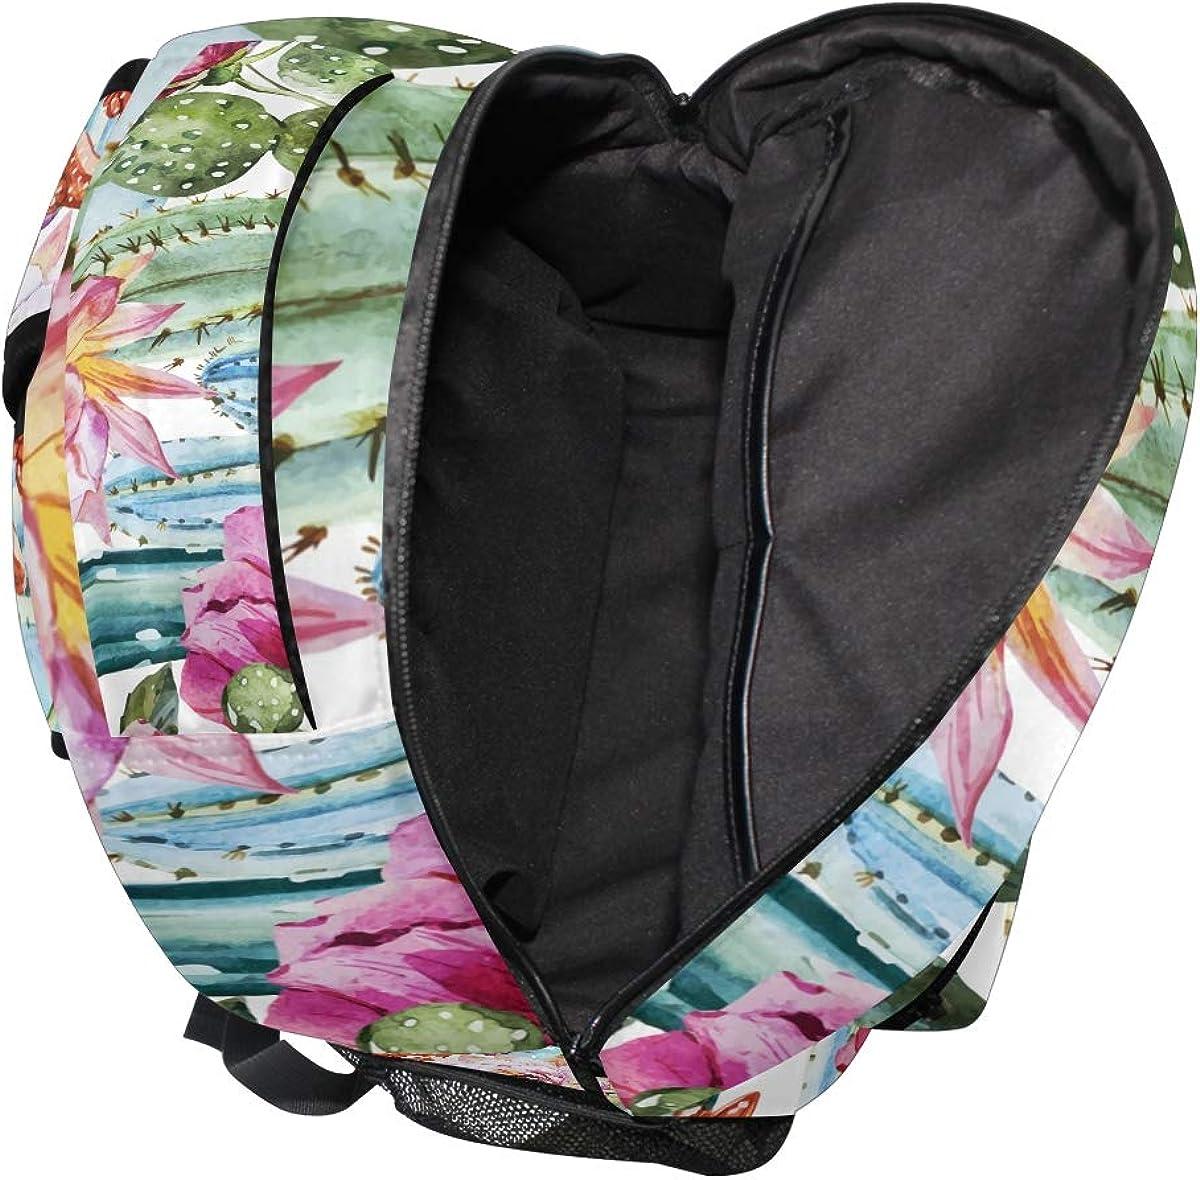 JOKERR Backpack Tropical Cactus Flower Large Capacity Casual Printed Shoulder Bag Daypack Travel Laptop Women Adults Boys Girls